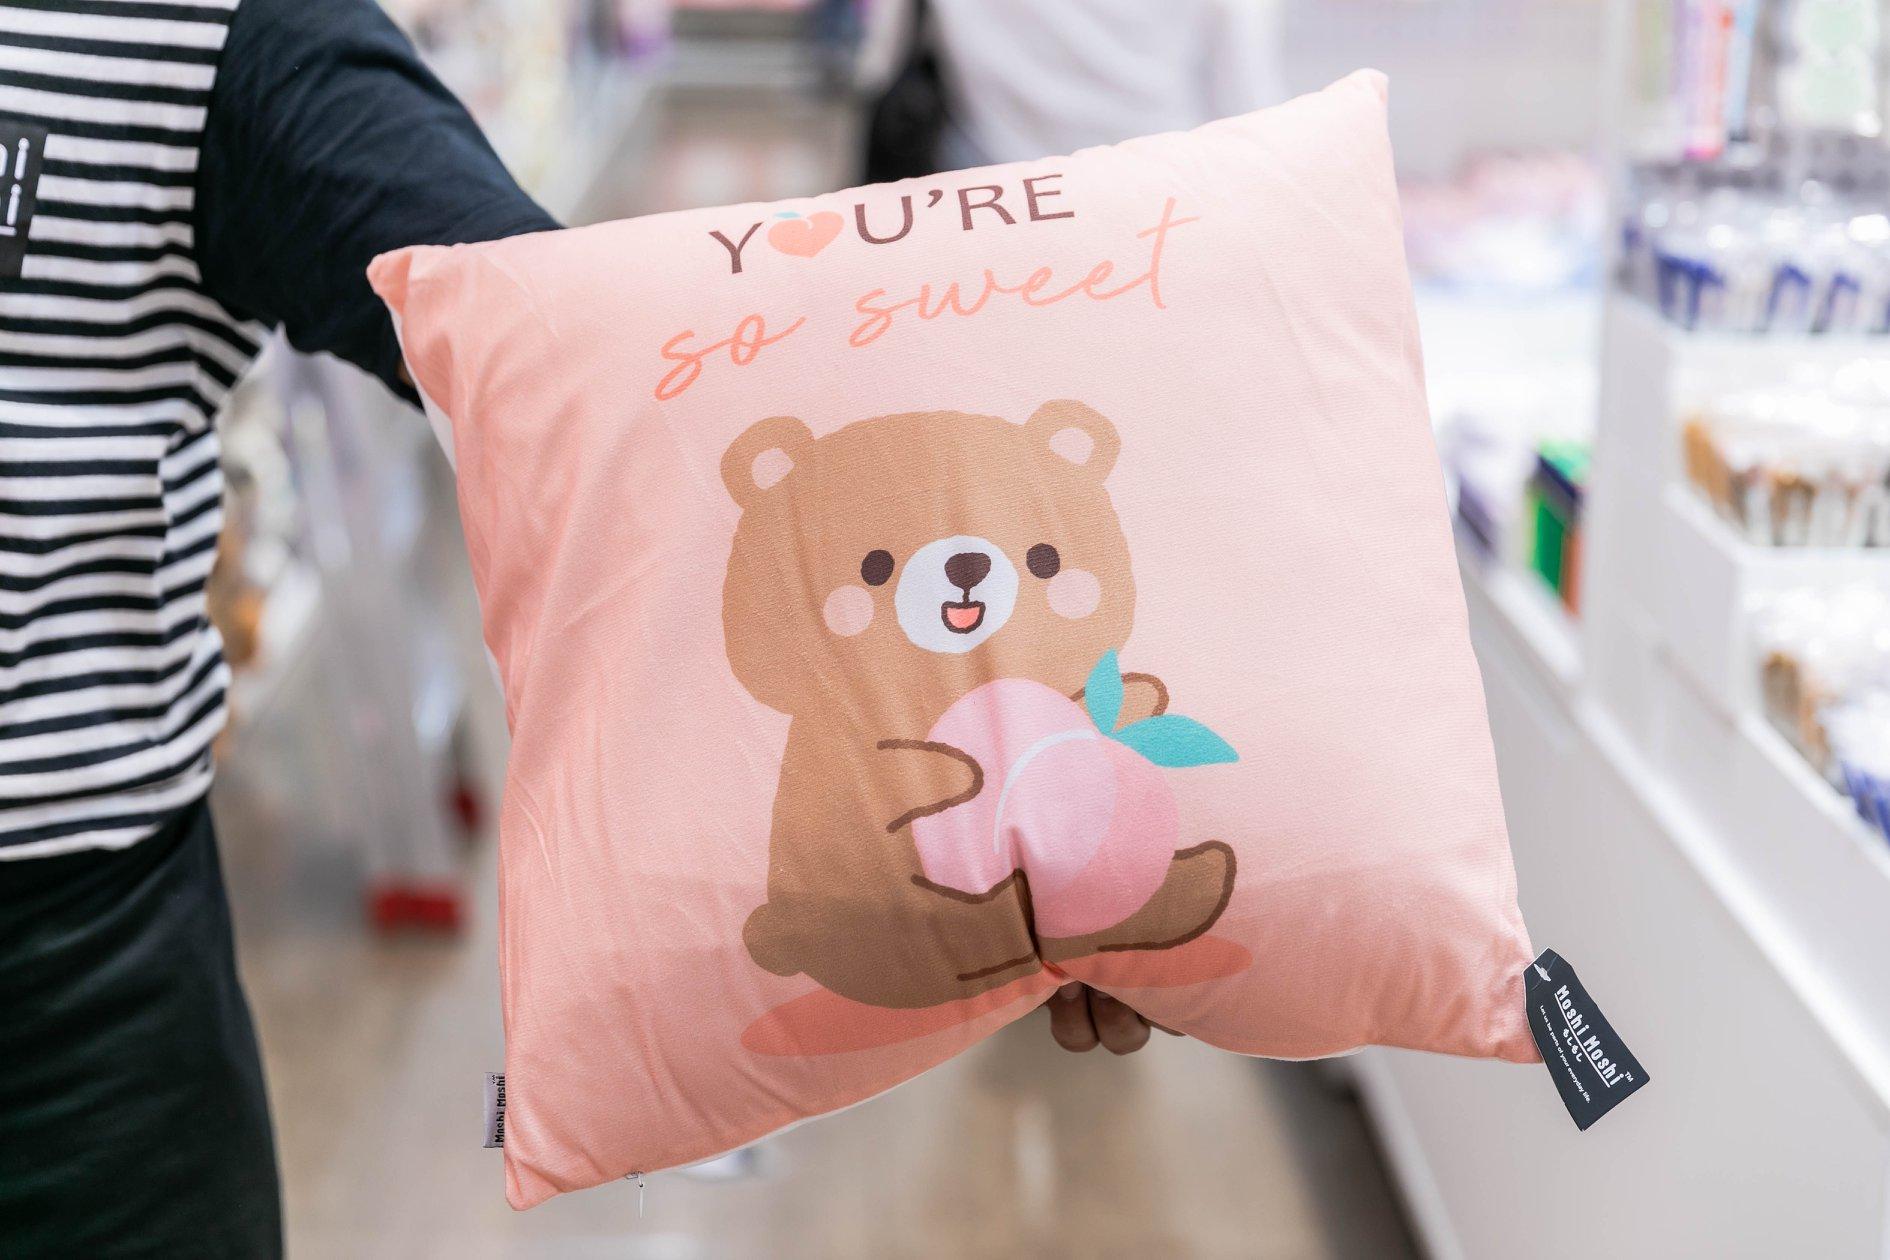 CentralNakornsithammarat,moshimoshi,โมชิโมชิ,สินค้าน่ารักราคาถูกใจ